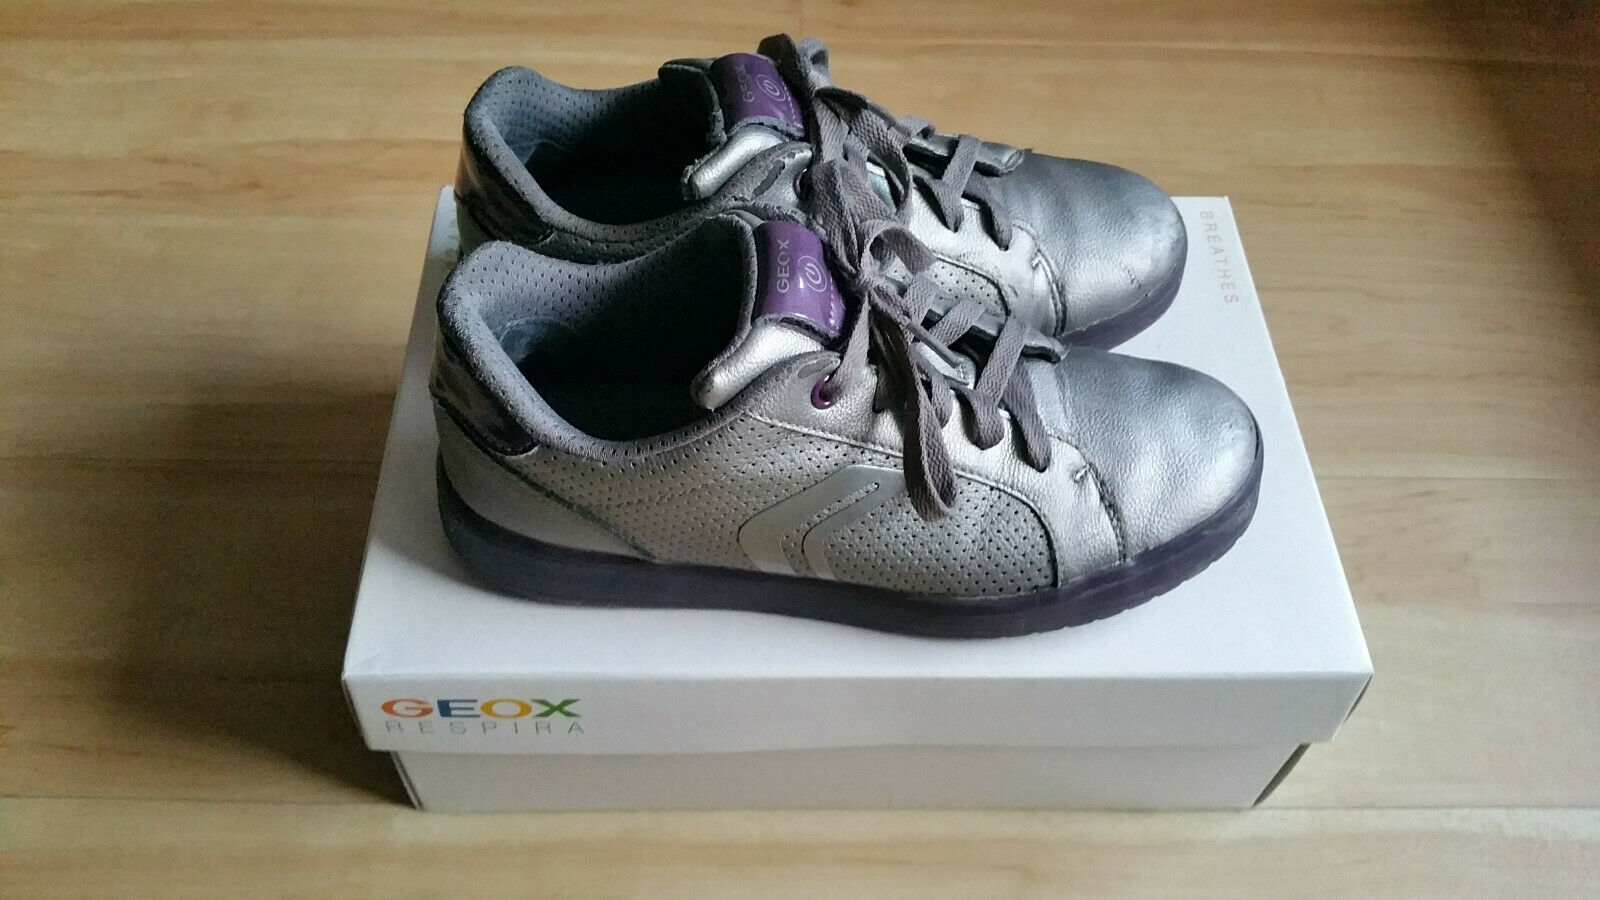 GEOX Schuhe Halbschuhe Sneakers Mädchen Gr. 37 GEOX